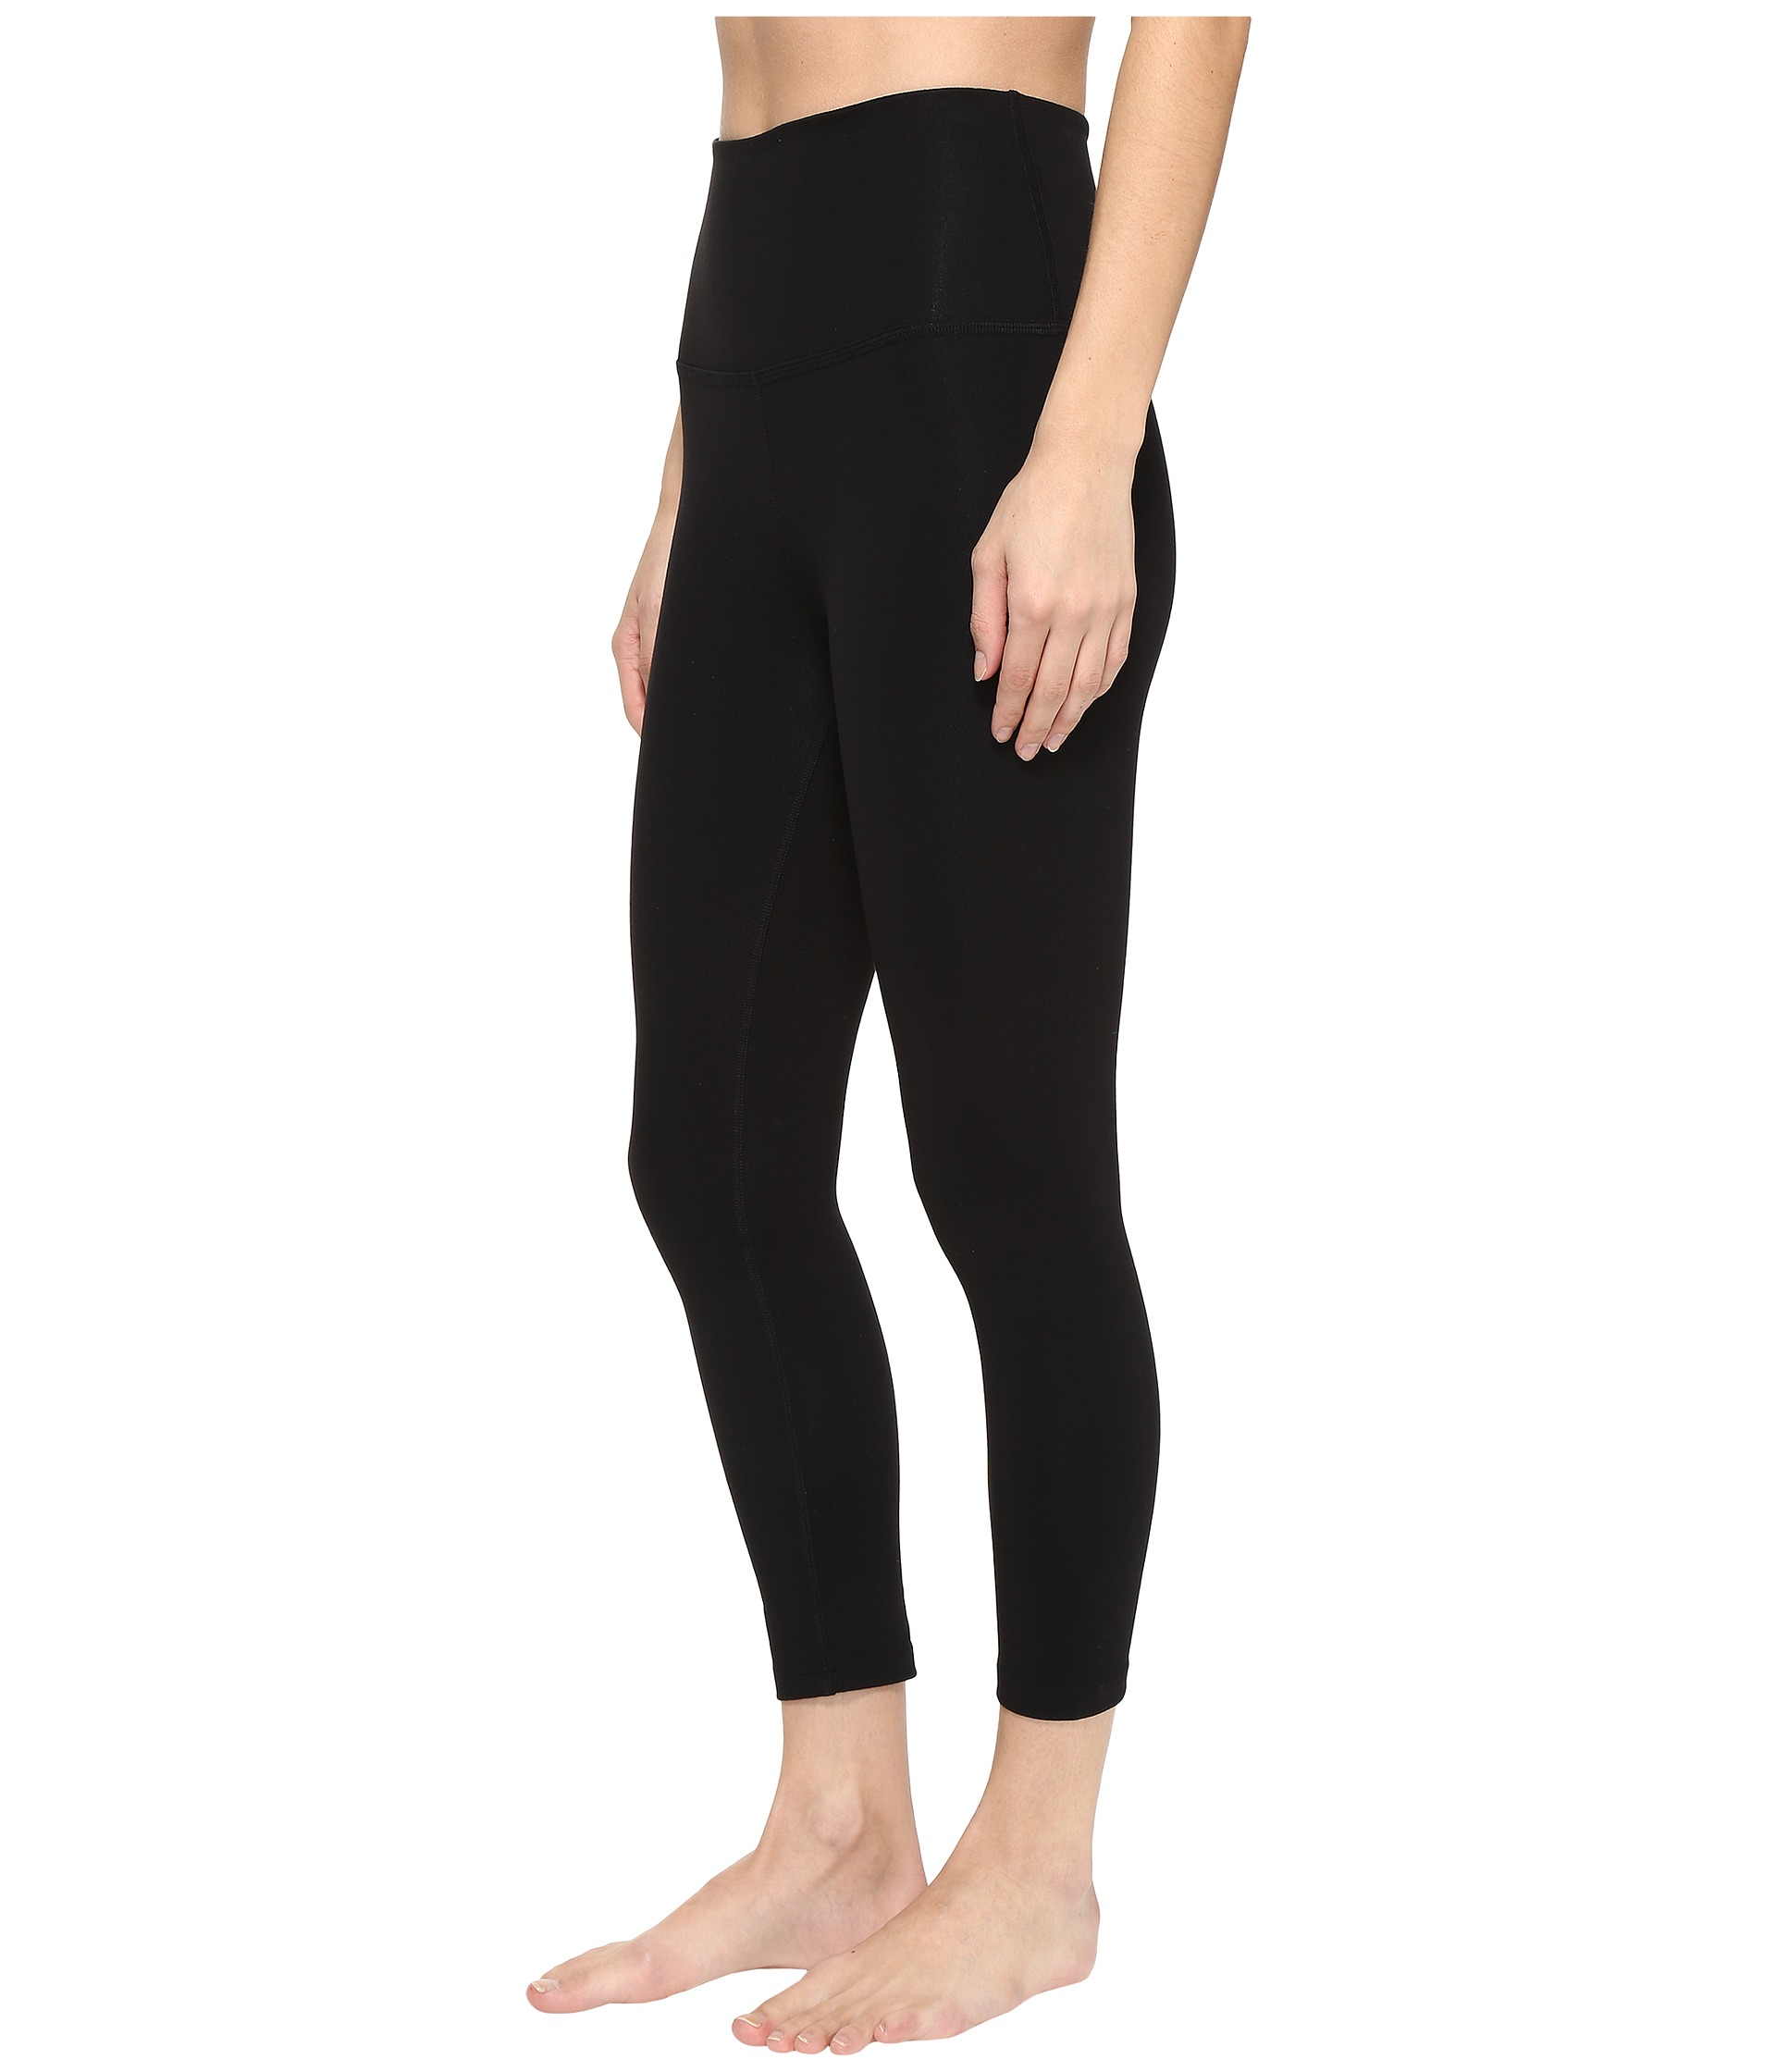 Beyond Yoga High Waist Capri Leggings at Zappos.com